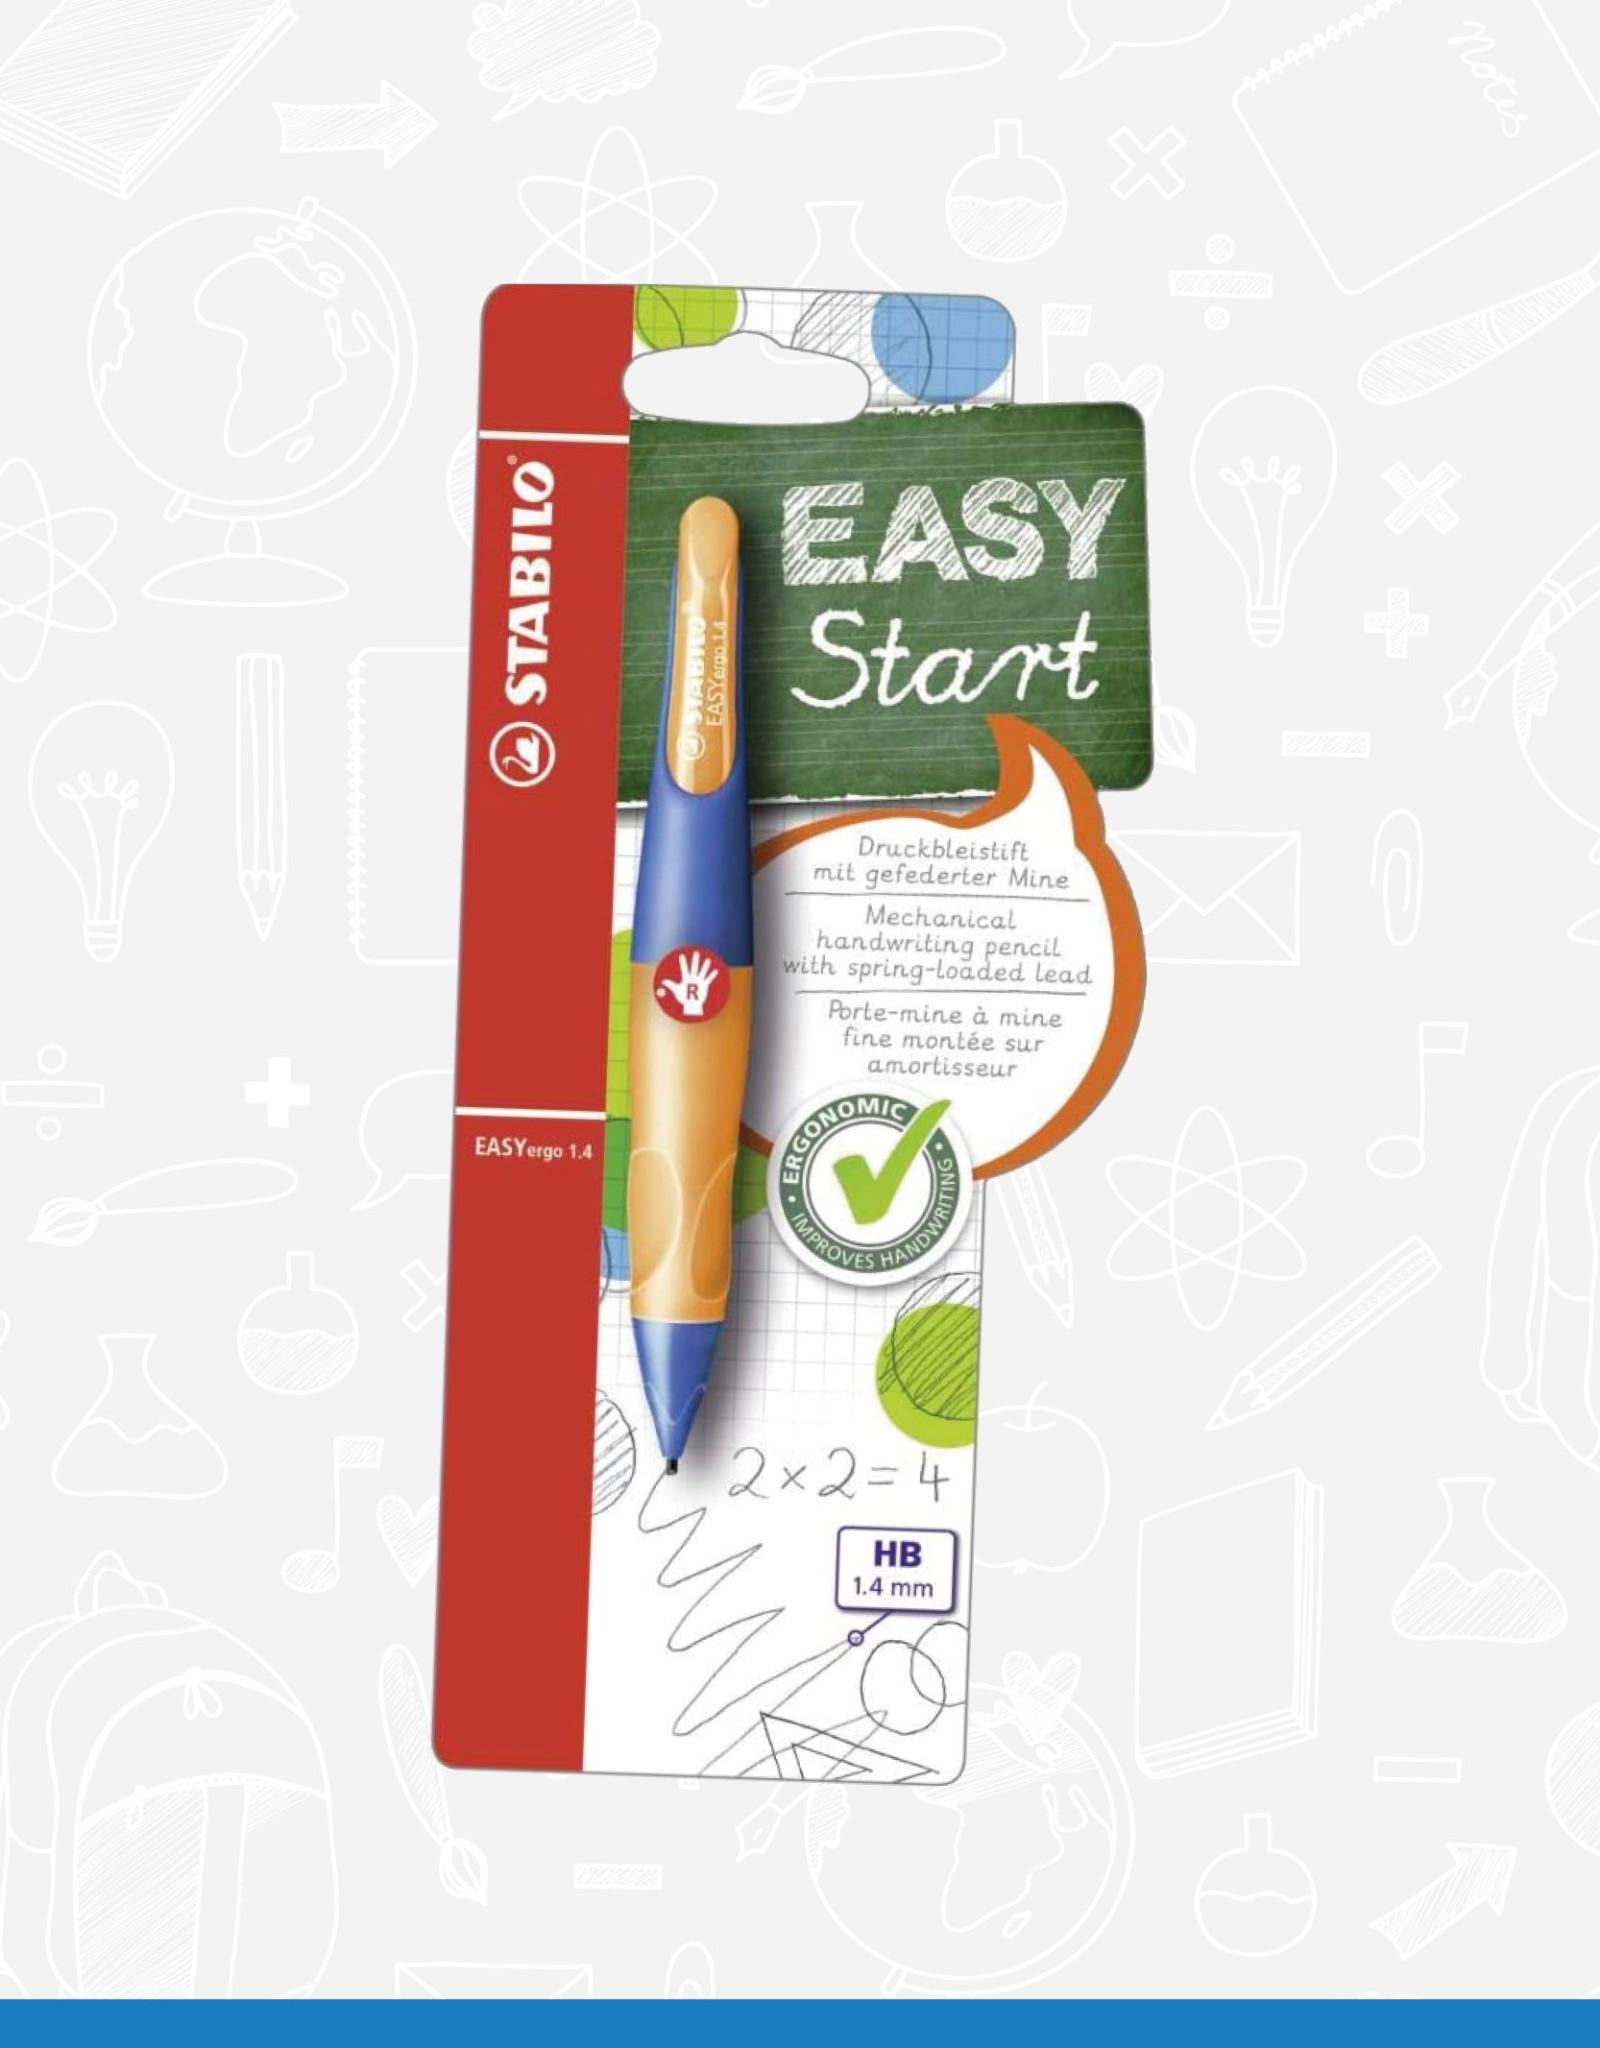 Stabilo Stabilo Easyergo 1.4 Right mix (B46908-5)